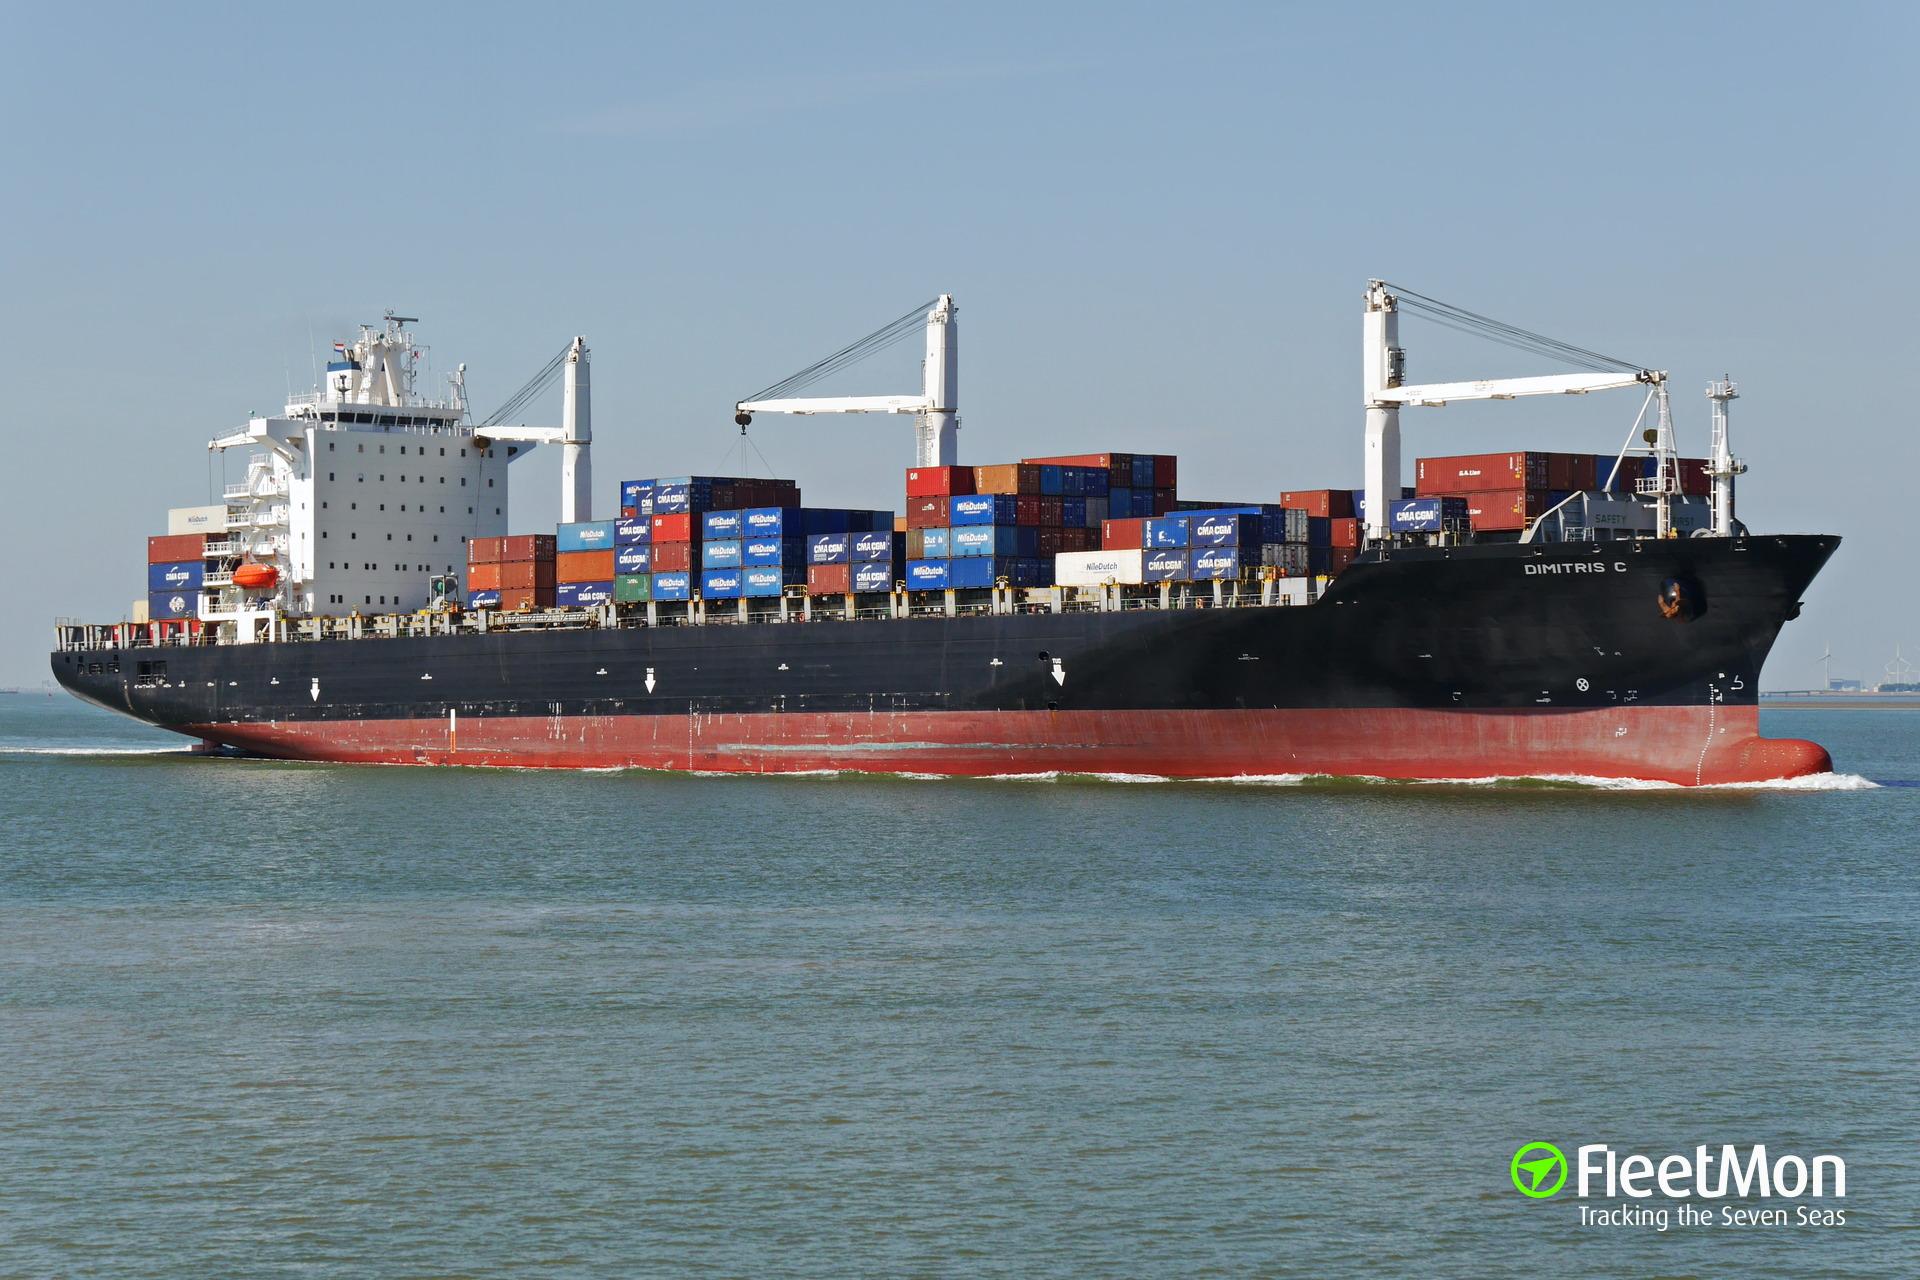   300 kilo of cocaine seized with the help of ship's Ukrainian crew, Italy